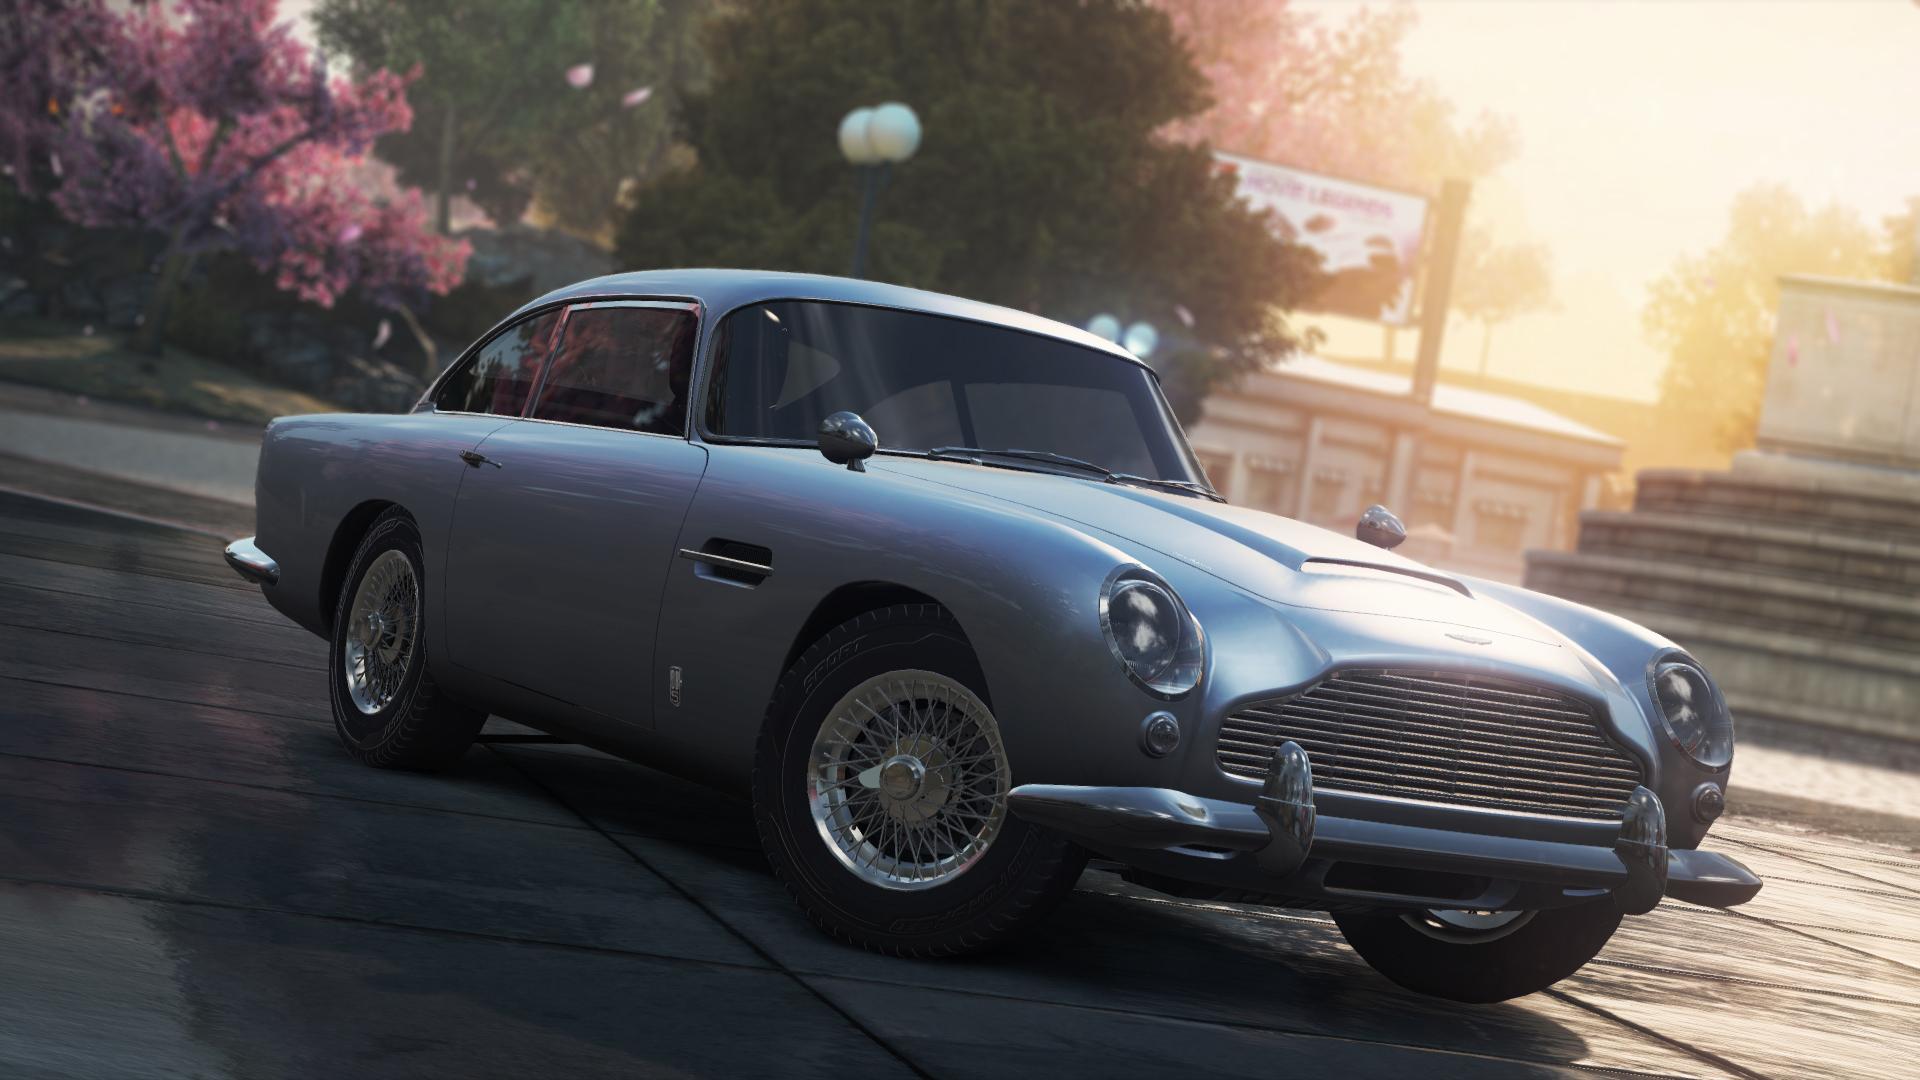 1964 Aston Martin DB5 Vantage infomation specifications